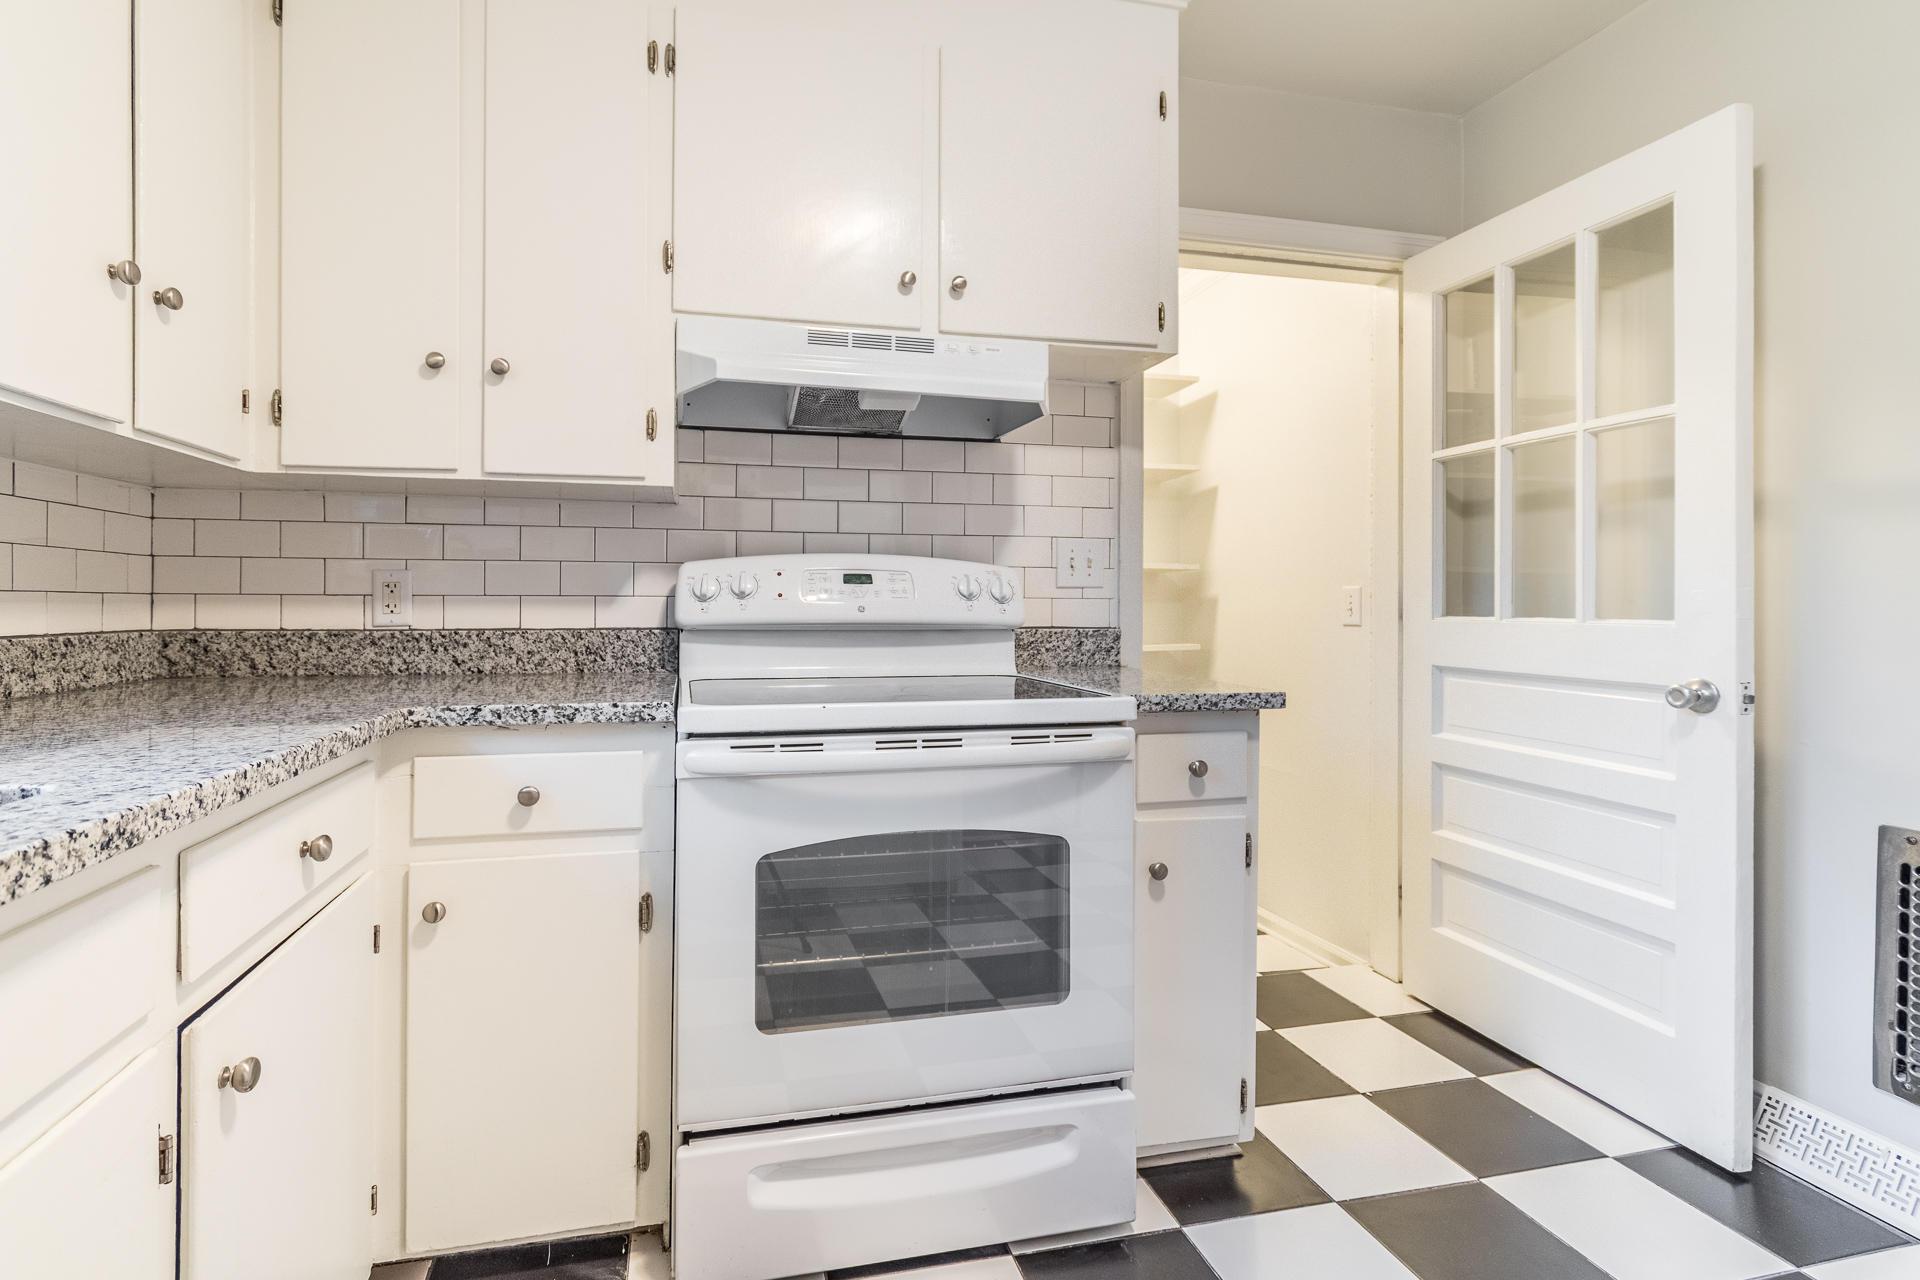 Edgewood Gardens Homes For Sale - 507 Risher, Charleston, SC - 11